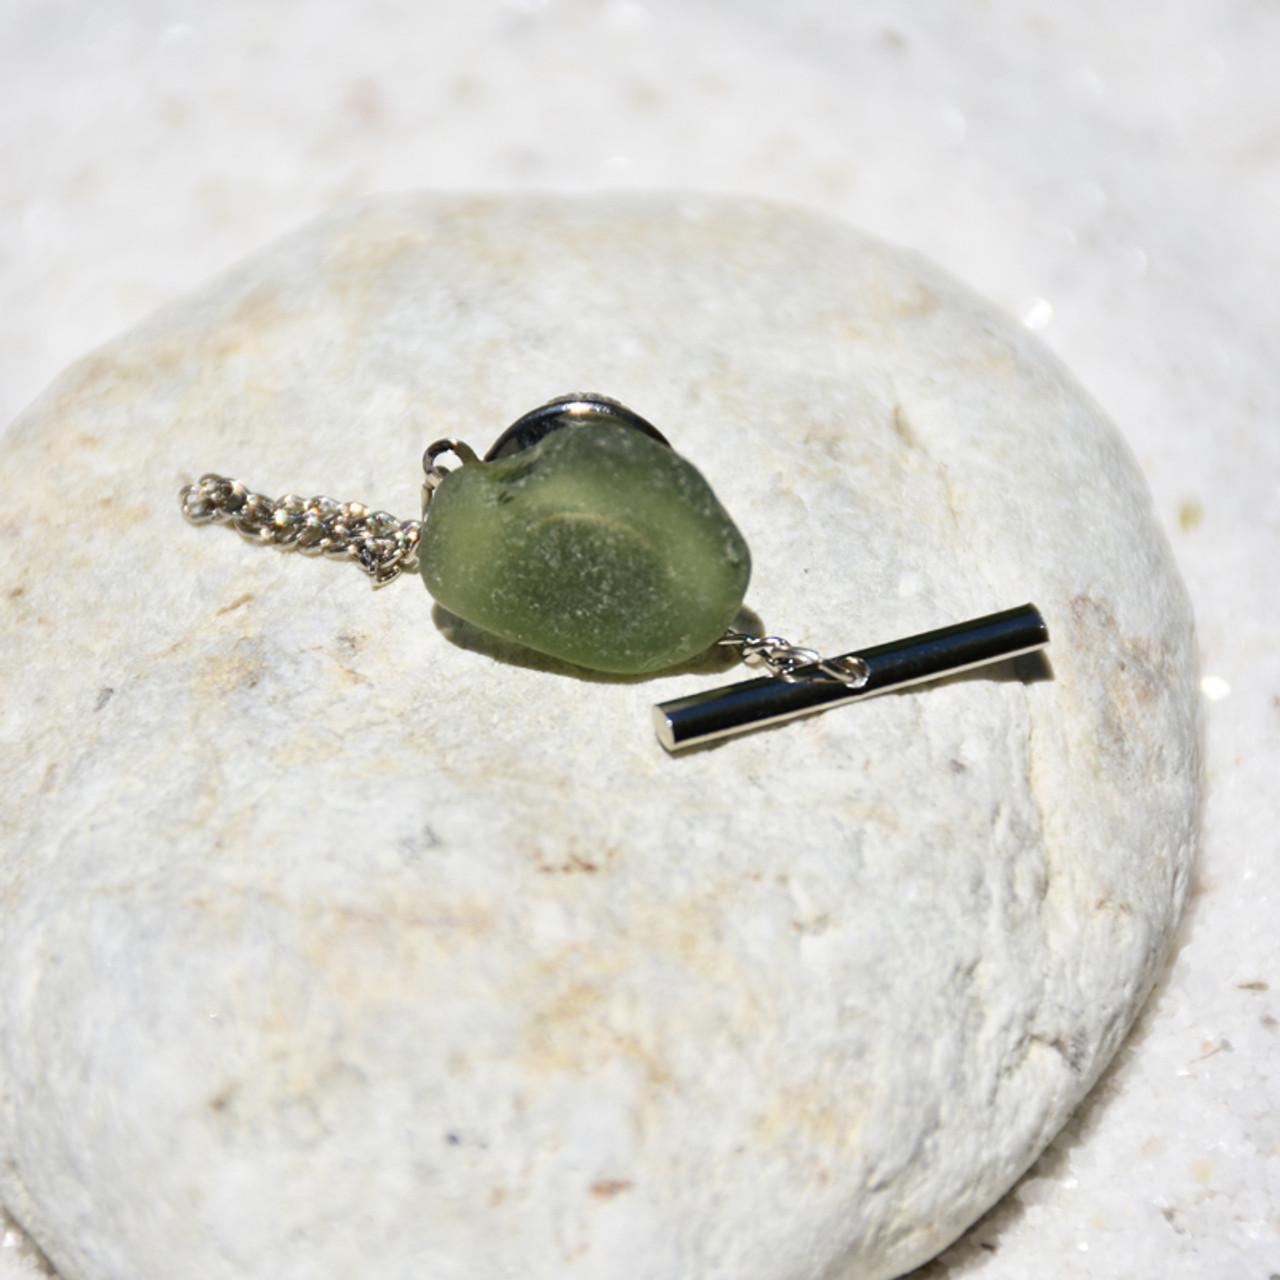 Olive Green Sea Glass Tie Tack